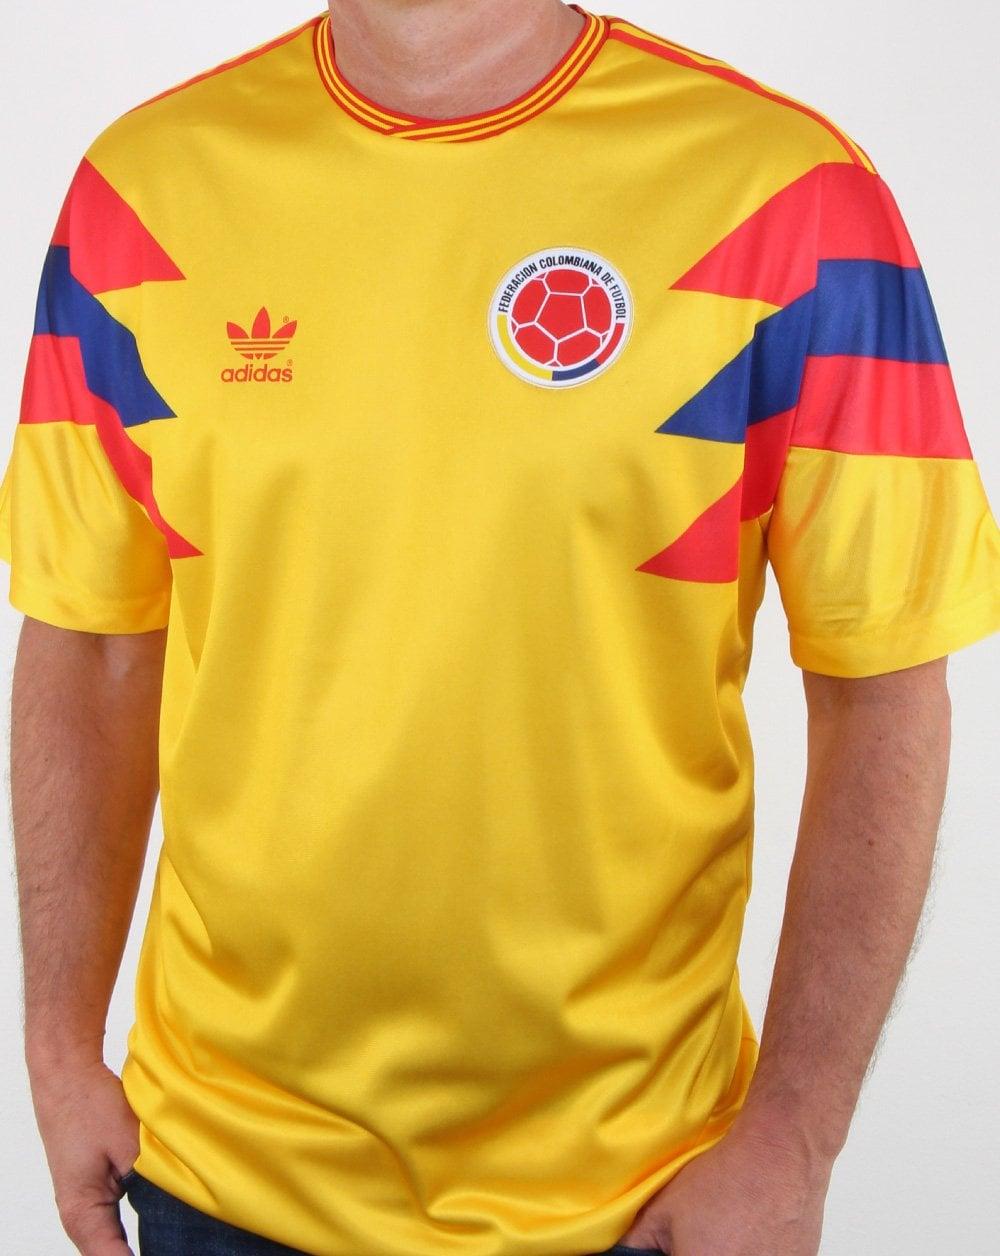 71901584c Adidas Originals Colombia Jersey Pure Yellow, Mens, Football, 1990